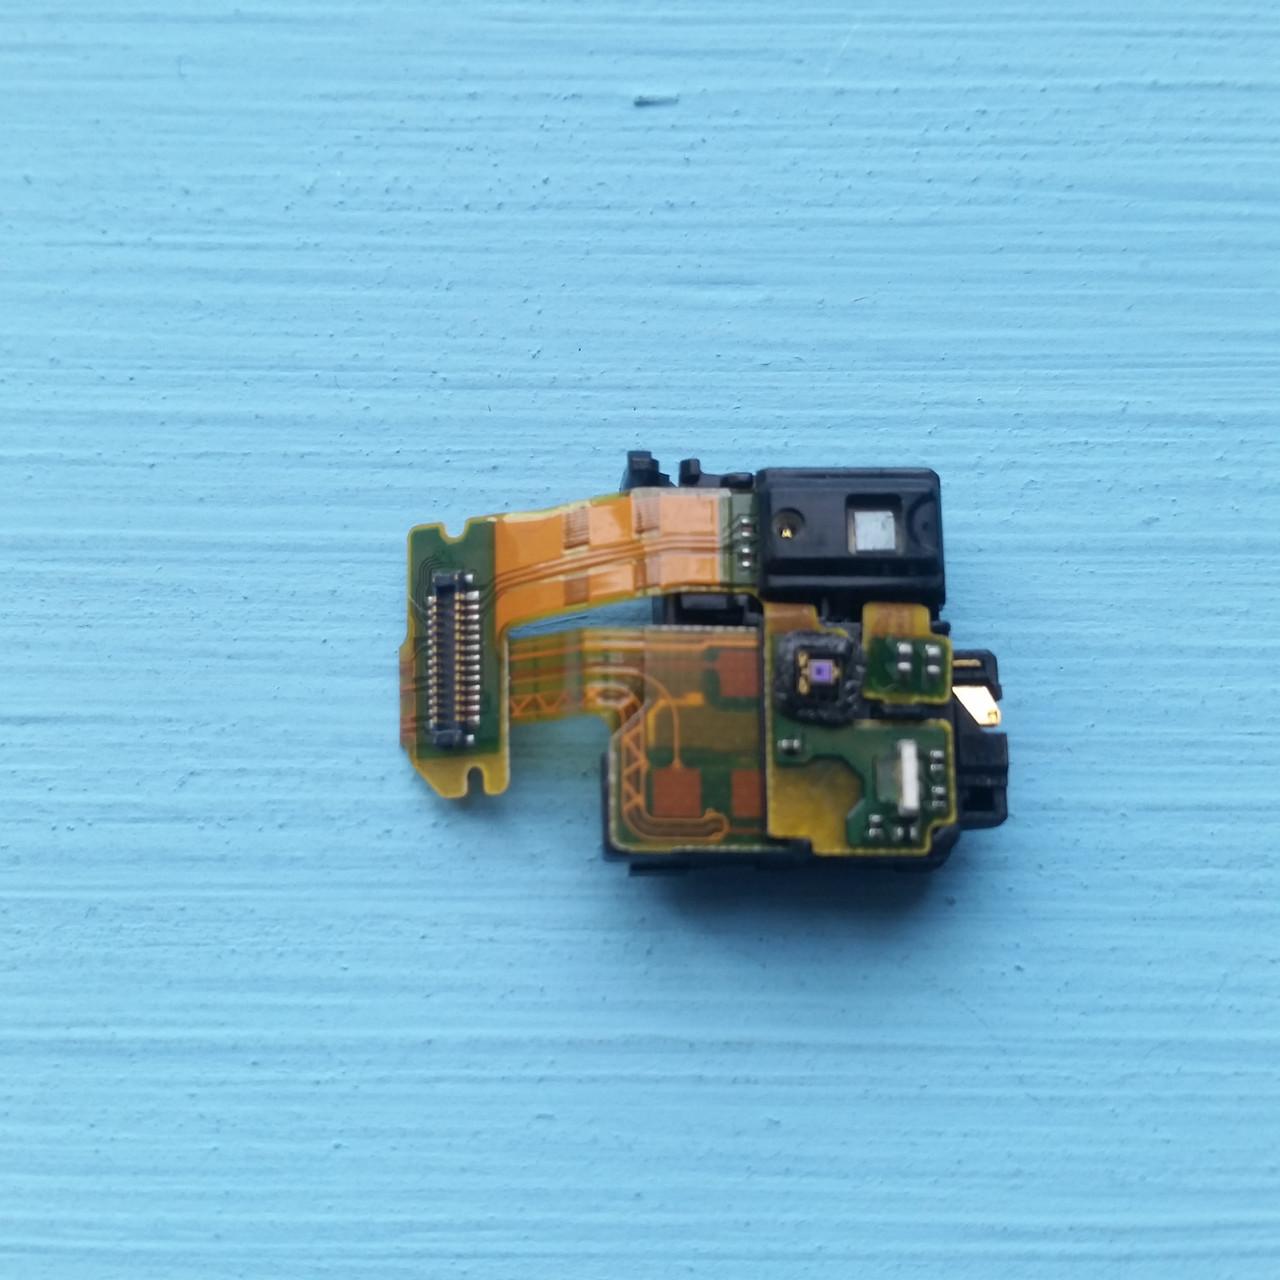 Шлейф для Sony C6602 L36h Xperia Z, C6603 L36i Xperia Z, C6606 L36a Xperia Z, коннектора наушников